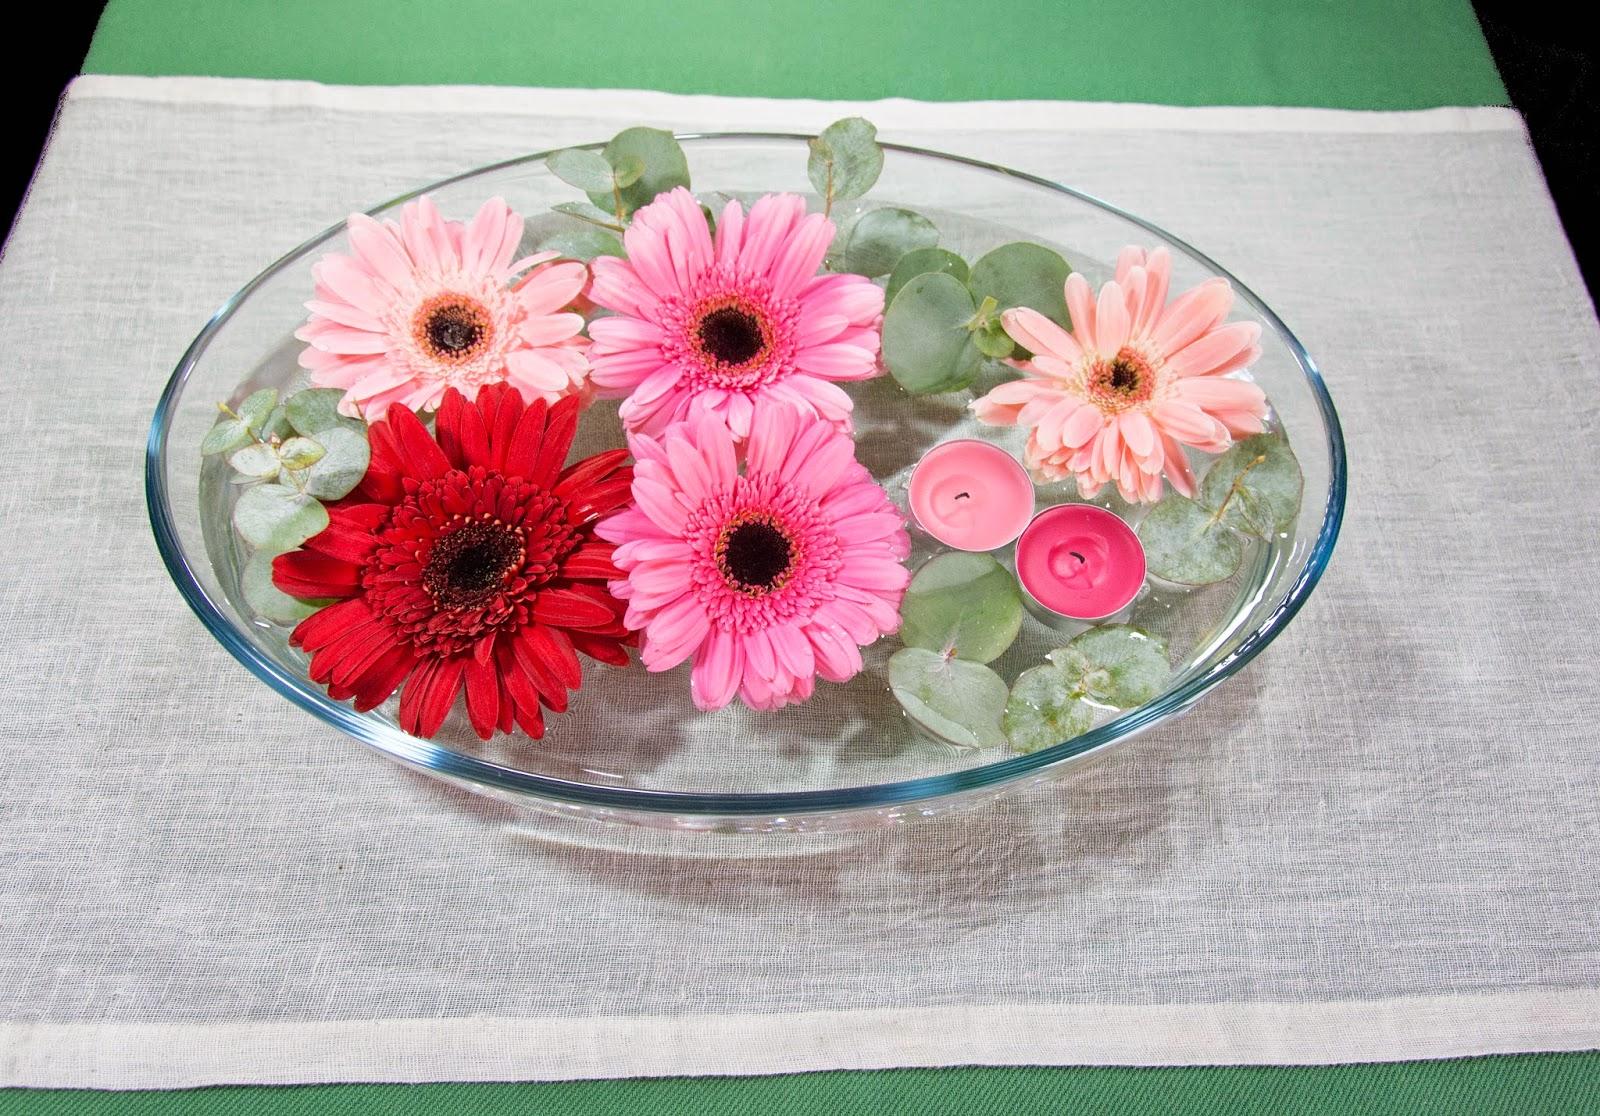 Imagenes de centros de mesa con flores naturales - Centros de rosas naturales ...